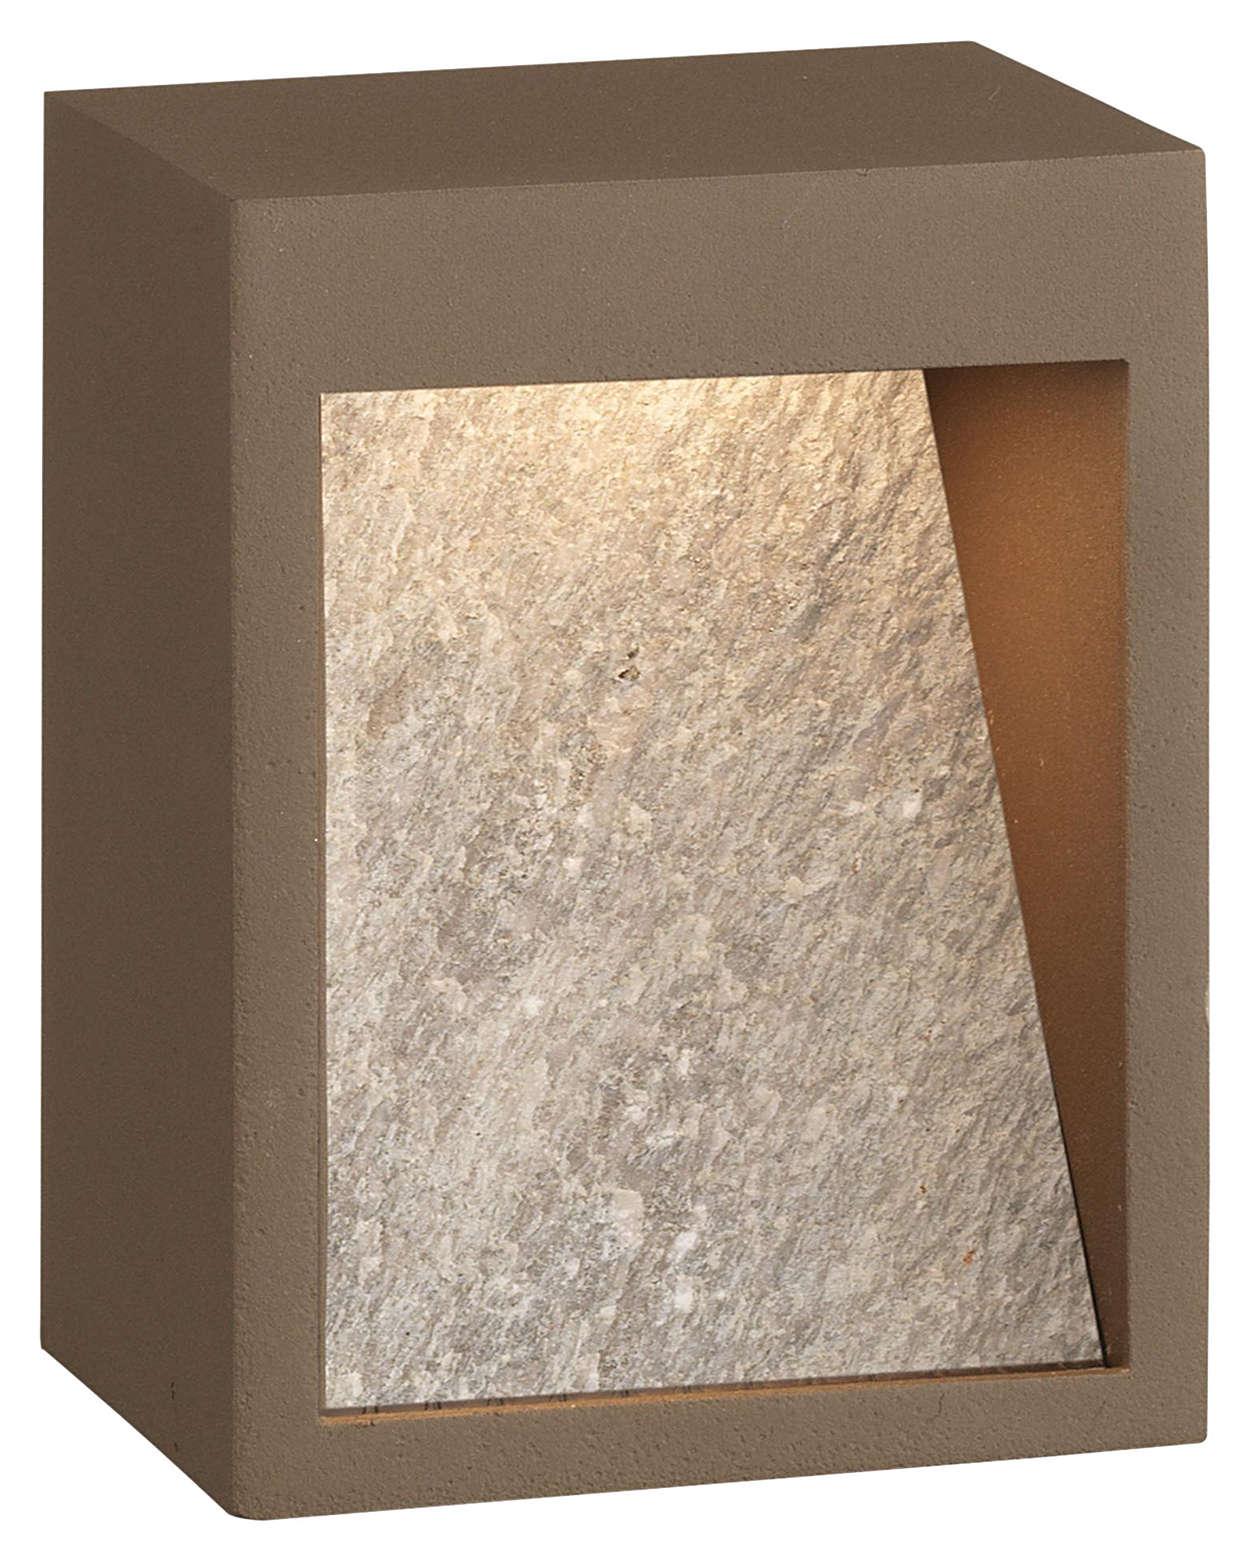 Moonbeam 1-light LED Wall in Bronze finish